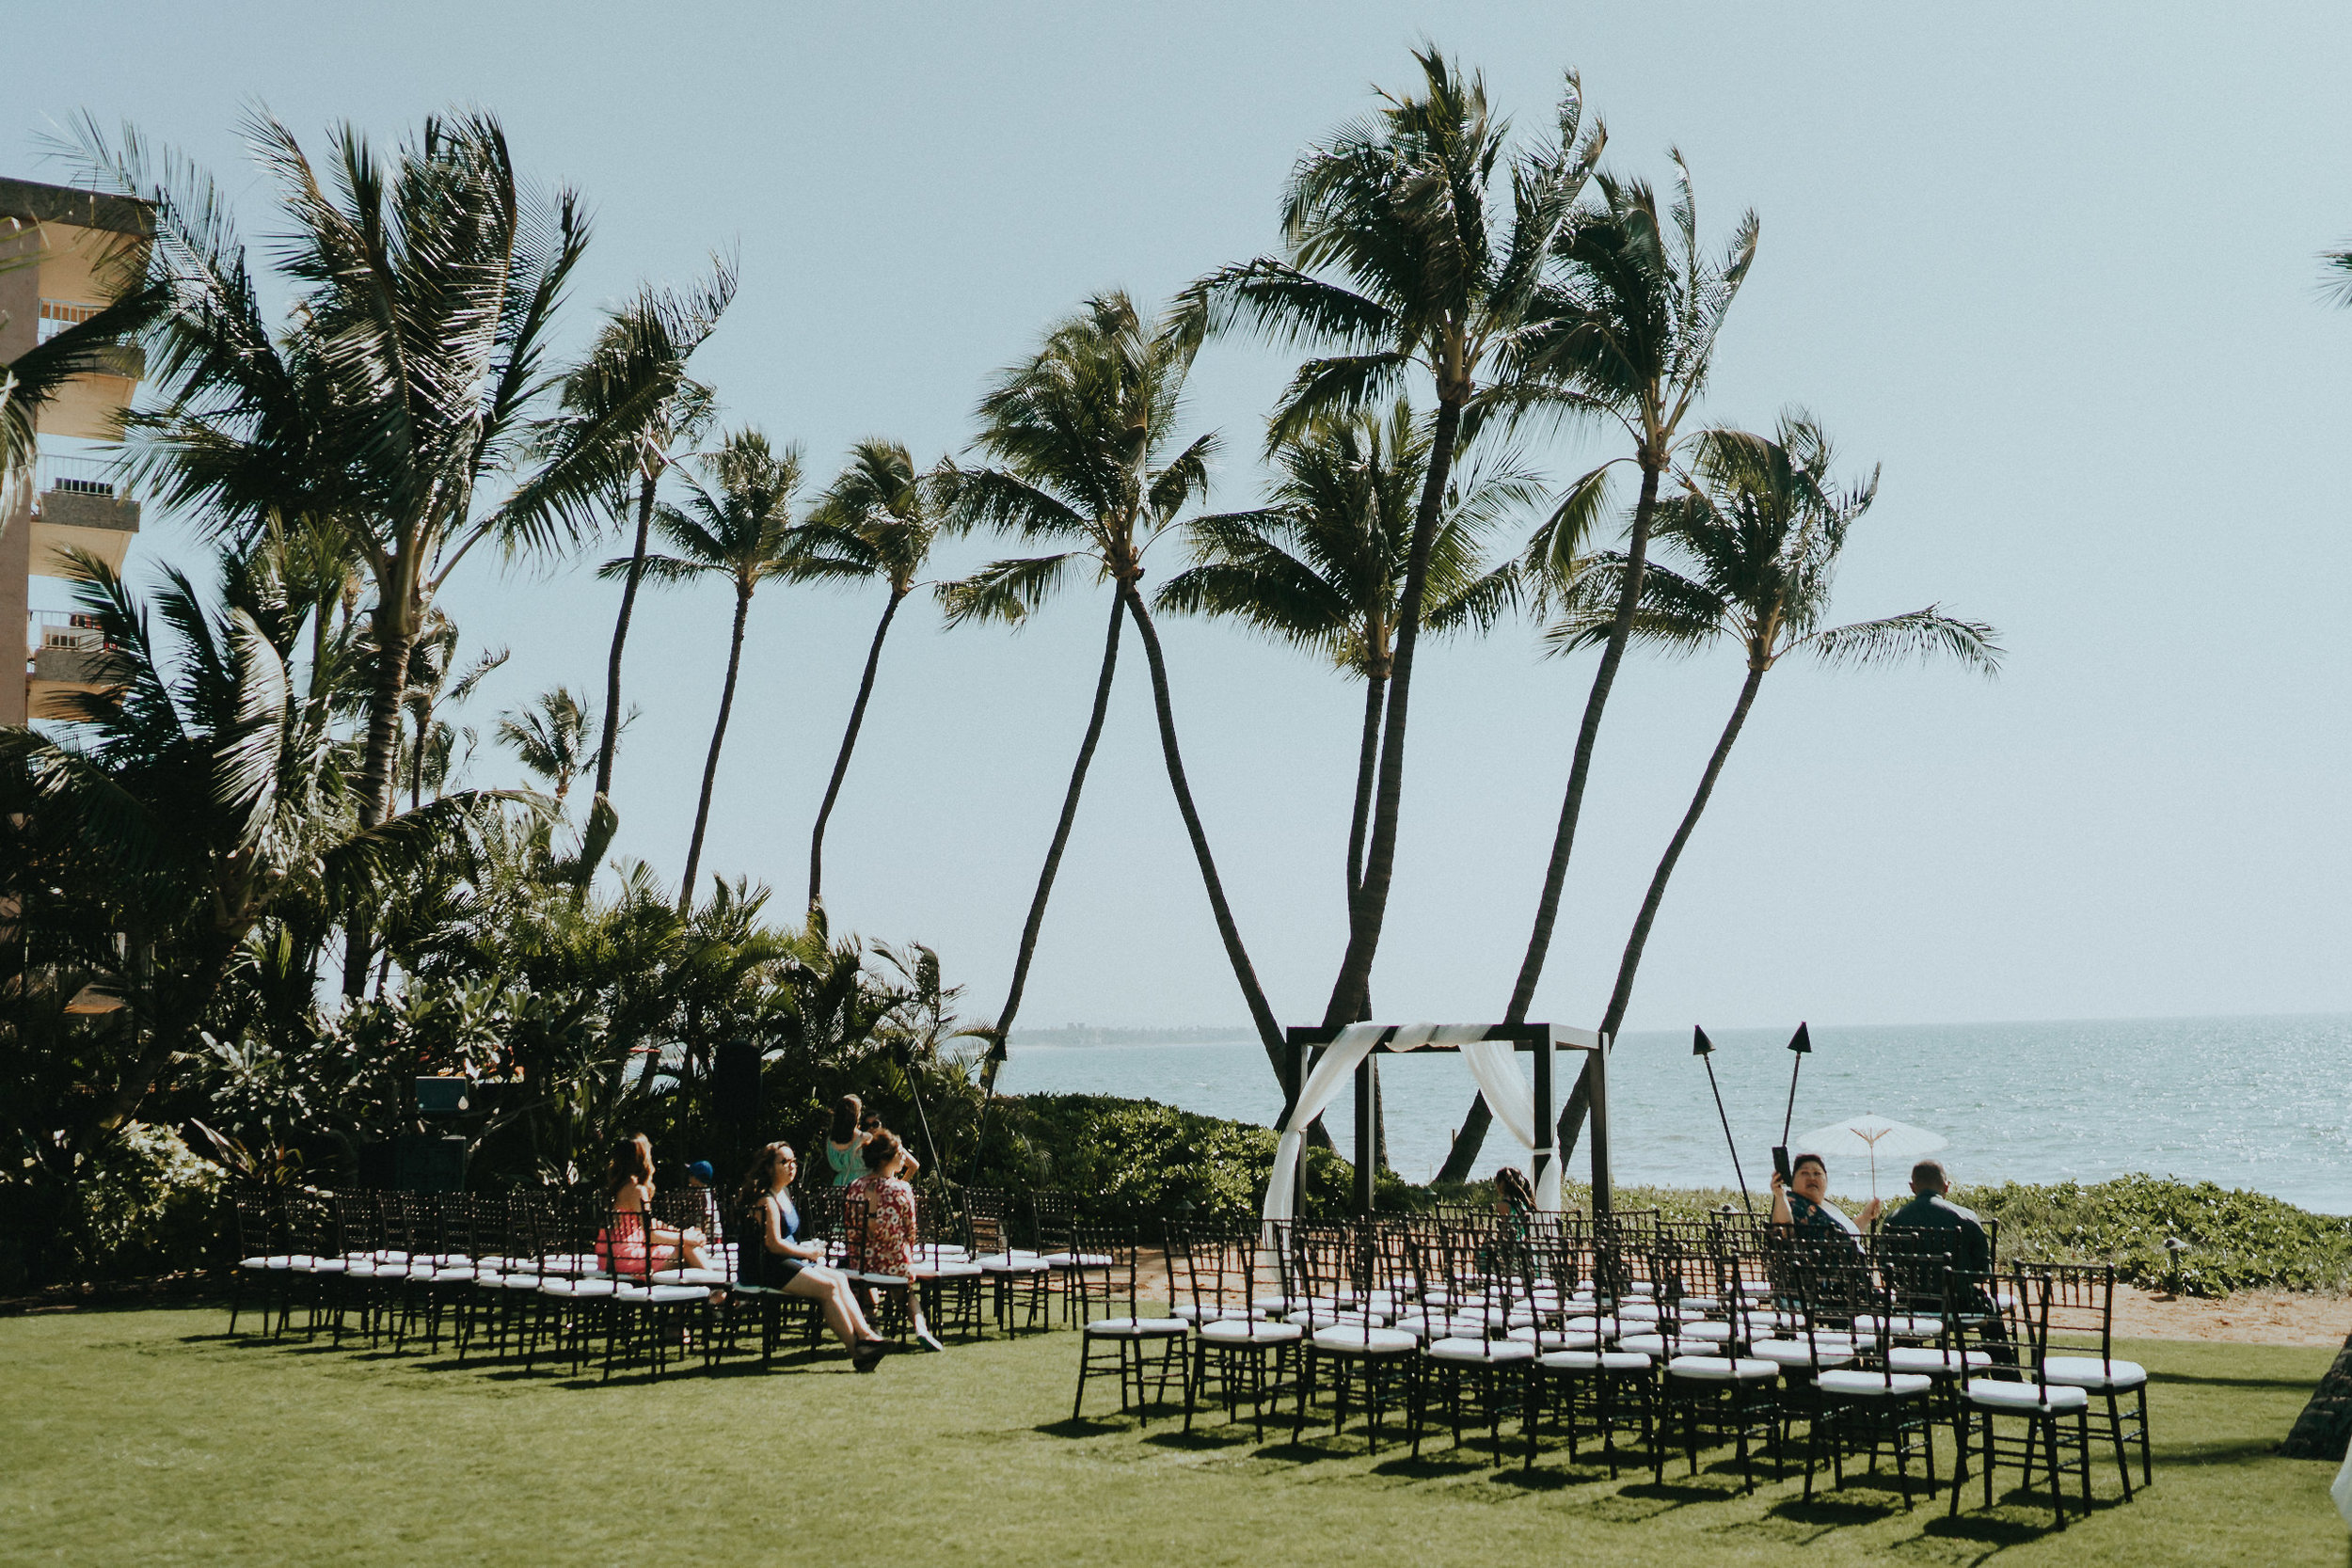 Maui_Destination_wedding_Alfred_Tang-07544.jpg